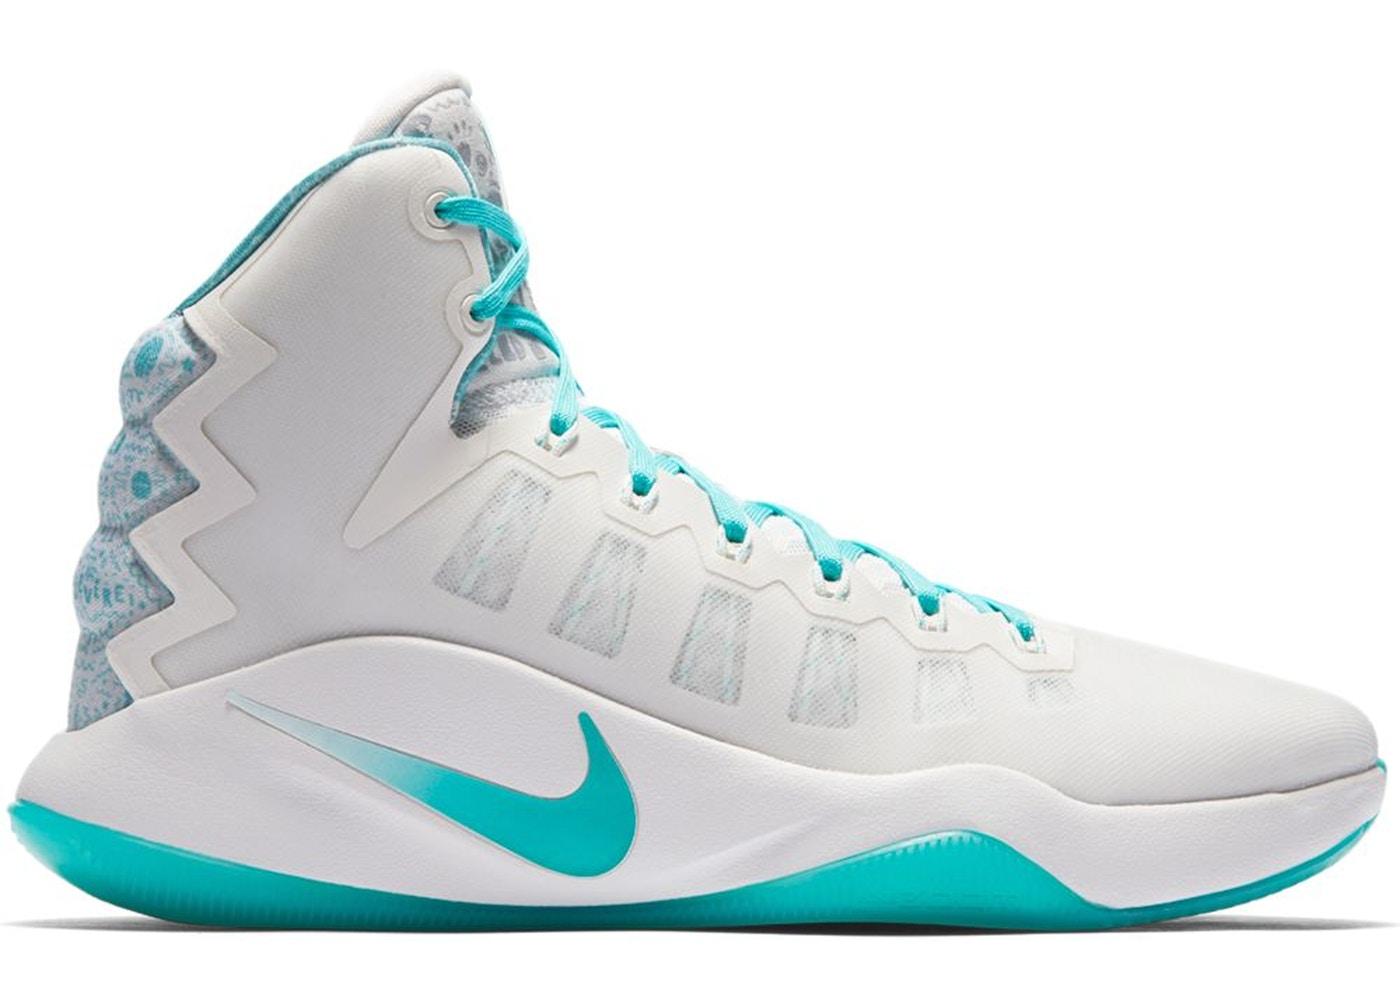 60213fb76389 Nike Hyperdunk 2016 Elena Delle Donne - 869484-999